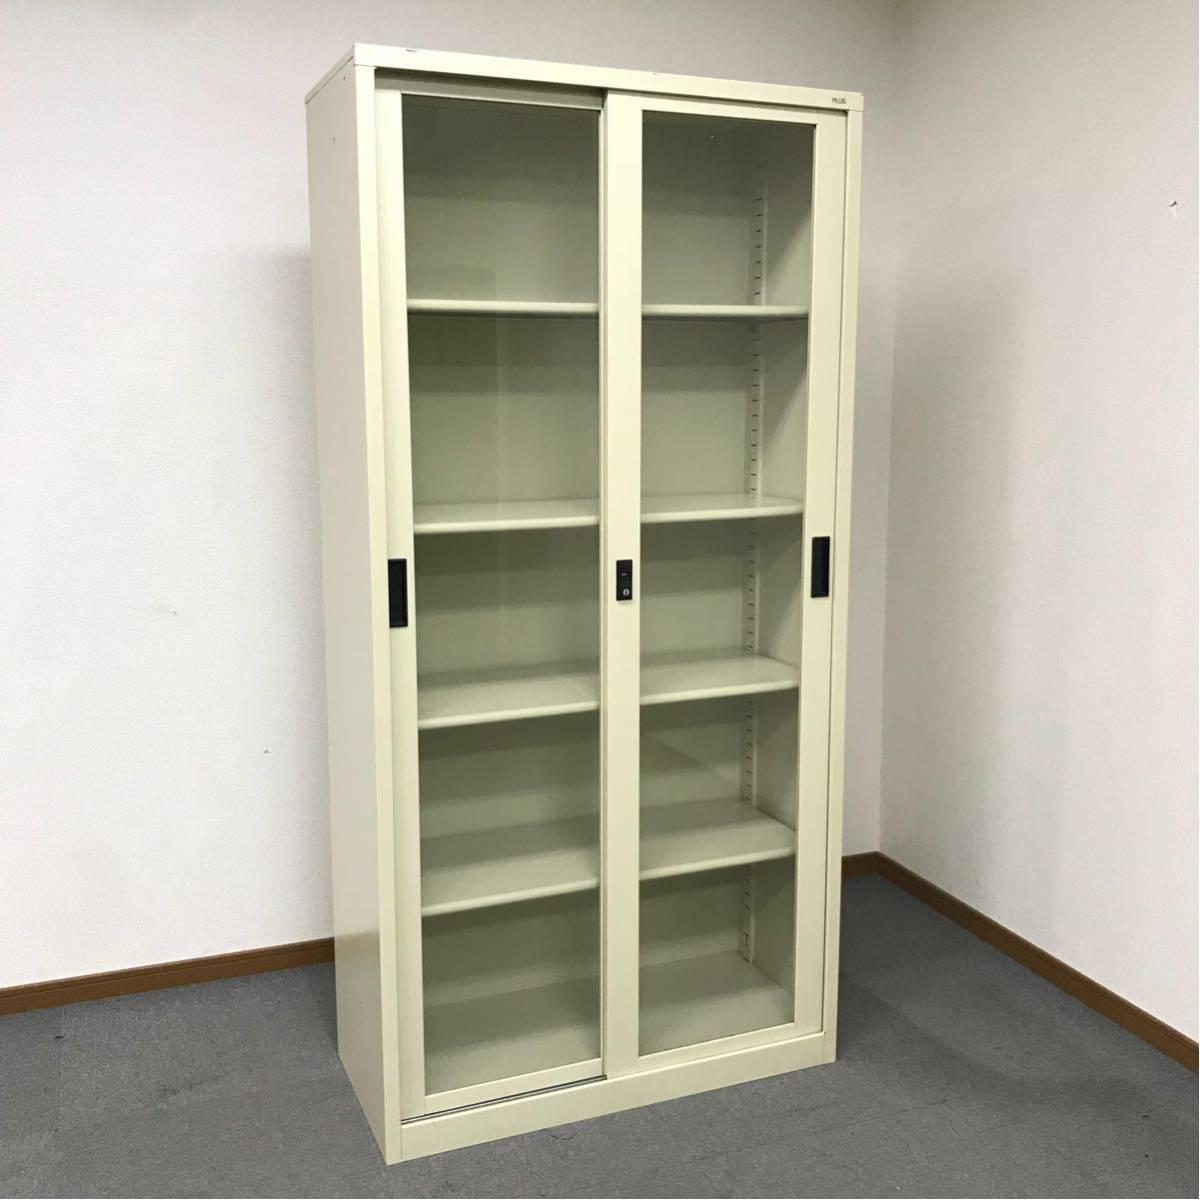 ◎PLUS ガラス引き違いキャビネット◎書庫 下置きタイプ◎ガラス戸◎オフィス 収納◎プラス◎A